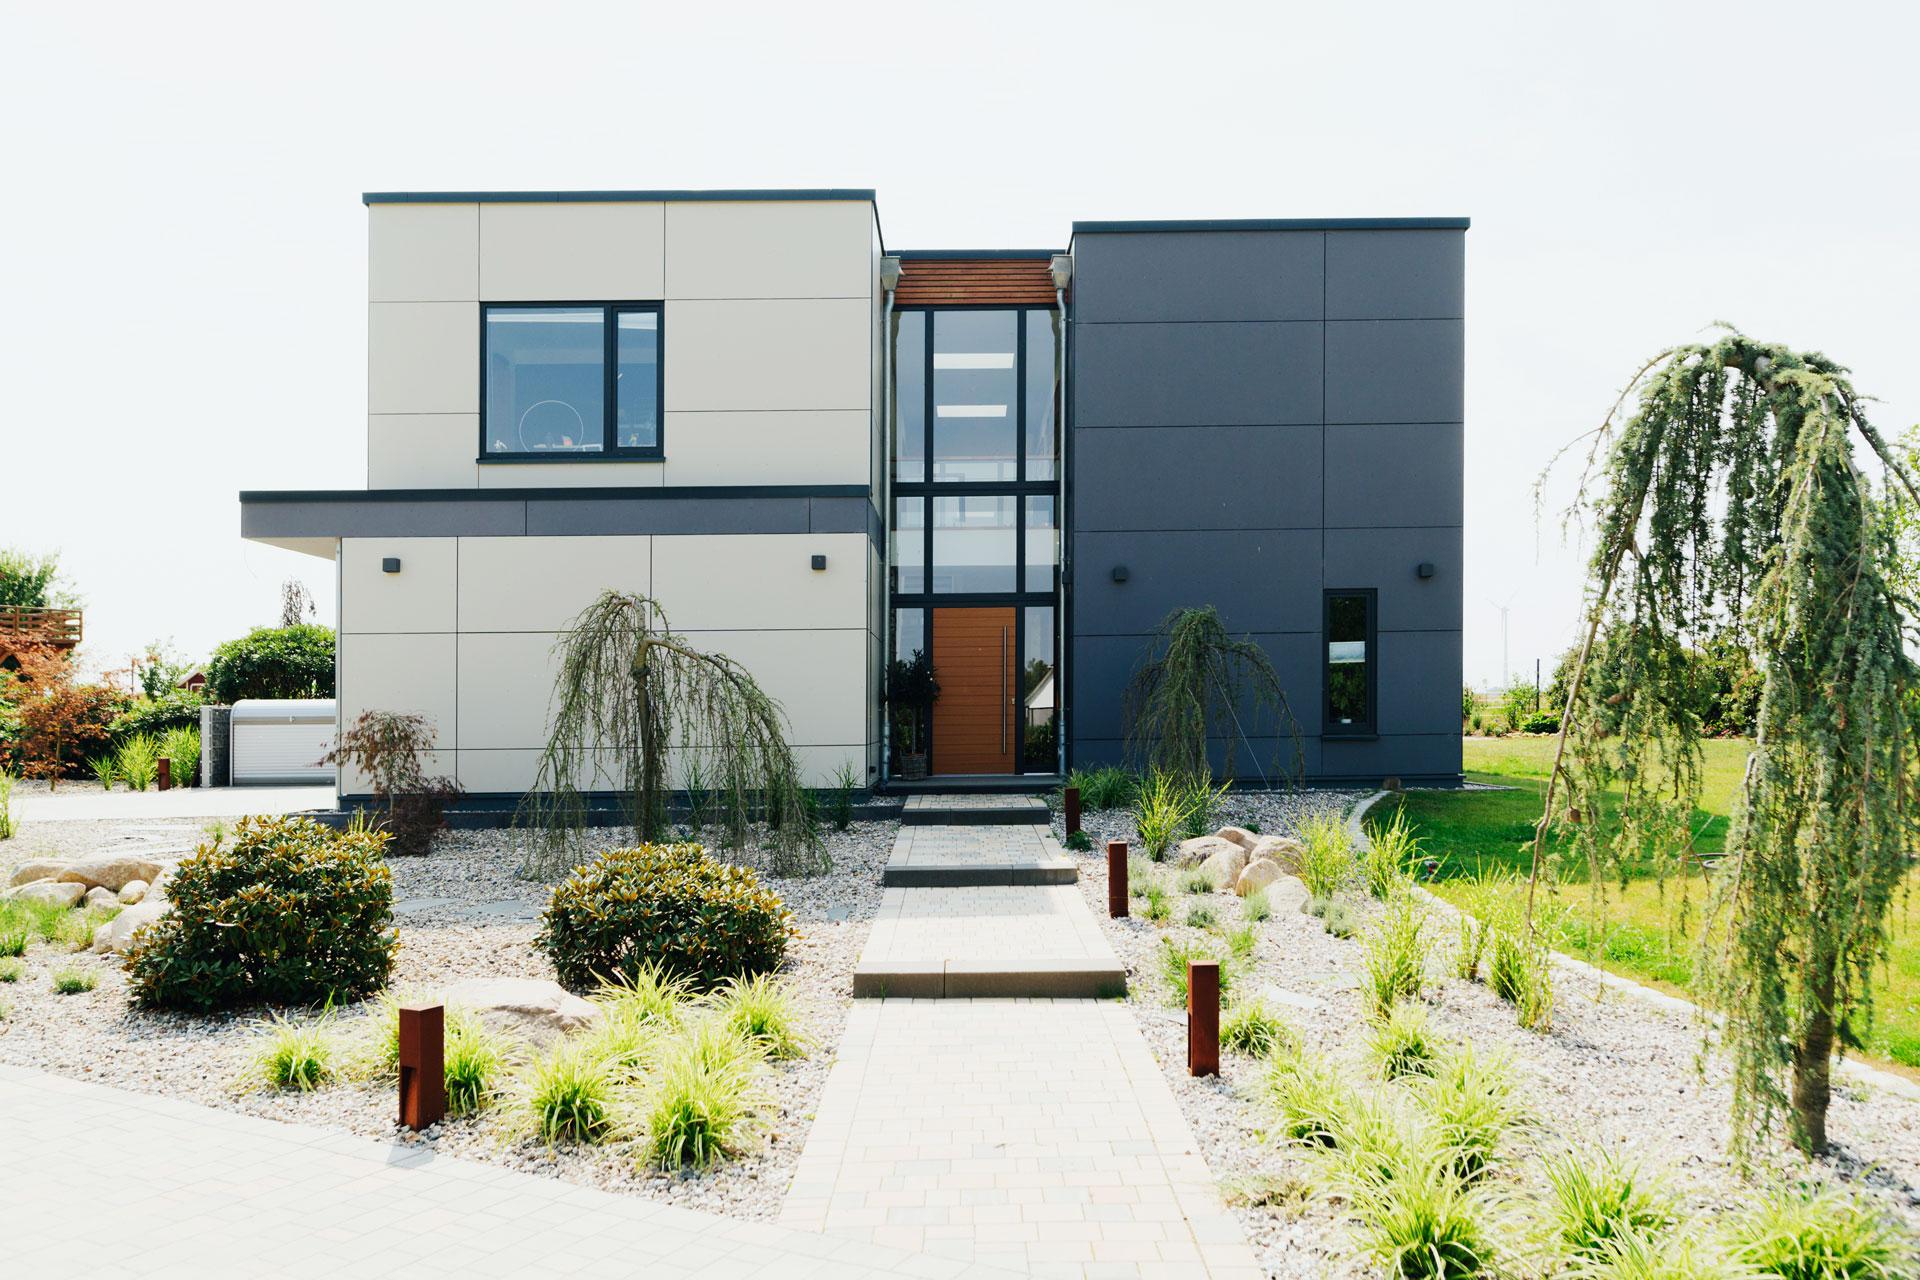 Einfamilienhaus im Landkreis Bad Doberan (07) / Totale